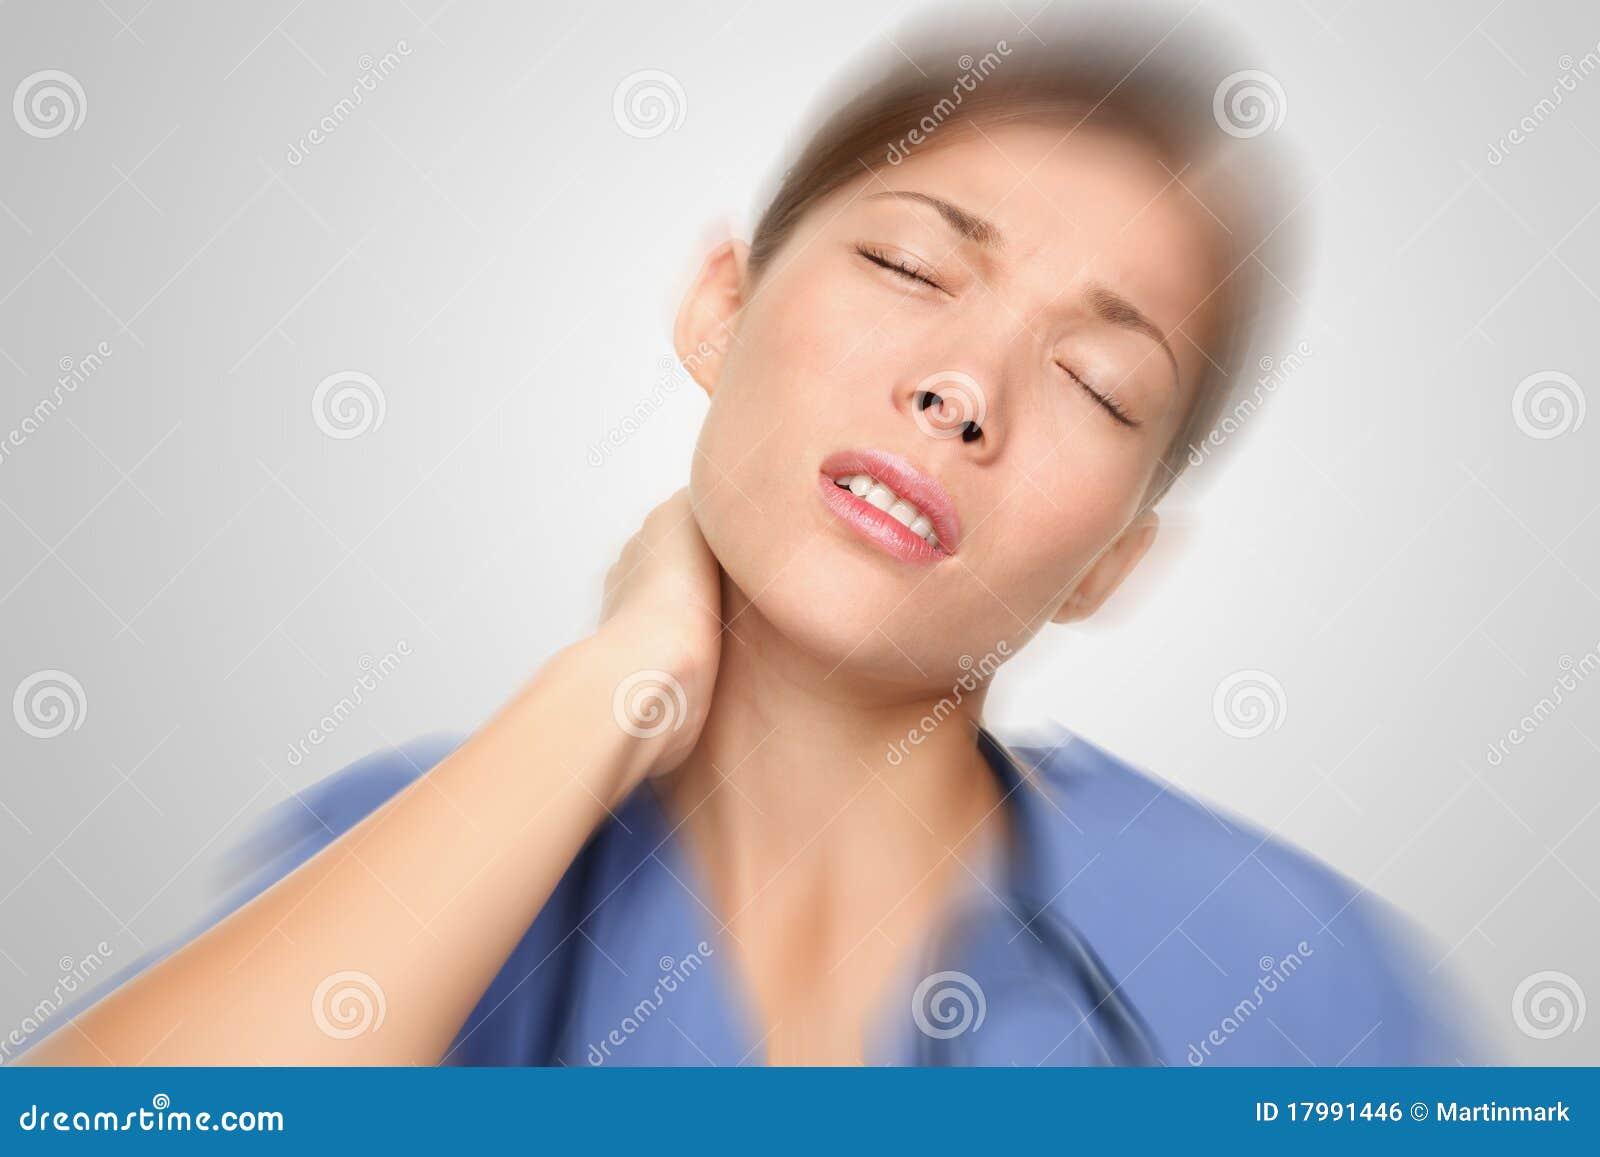 Nurse having neck and back pain